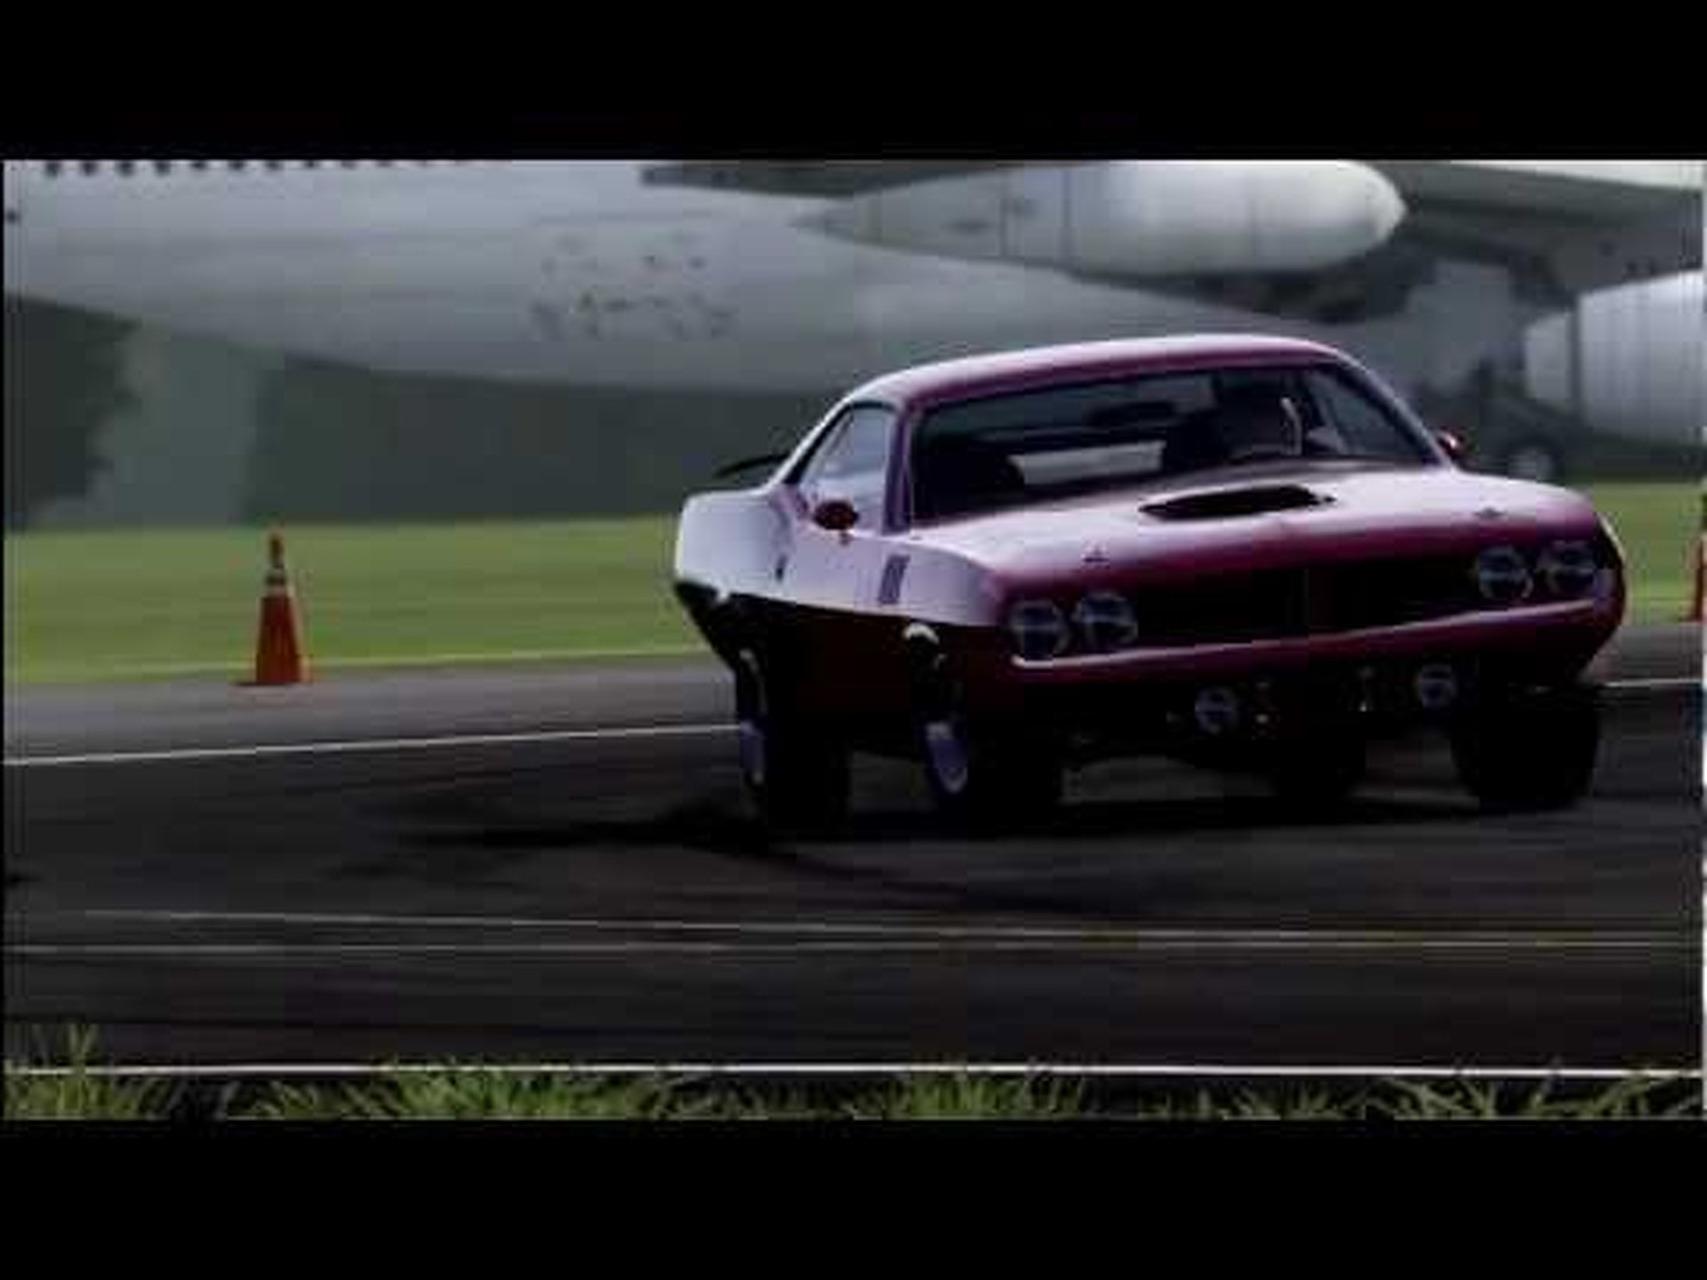 Forza Motorsport 4 Top Gear Power Laps: 1971 Plymouth Cuda 426 HEMI